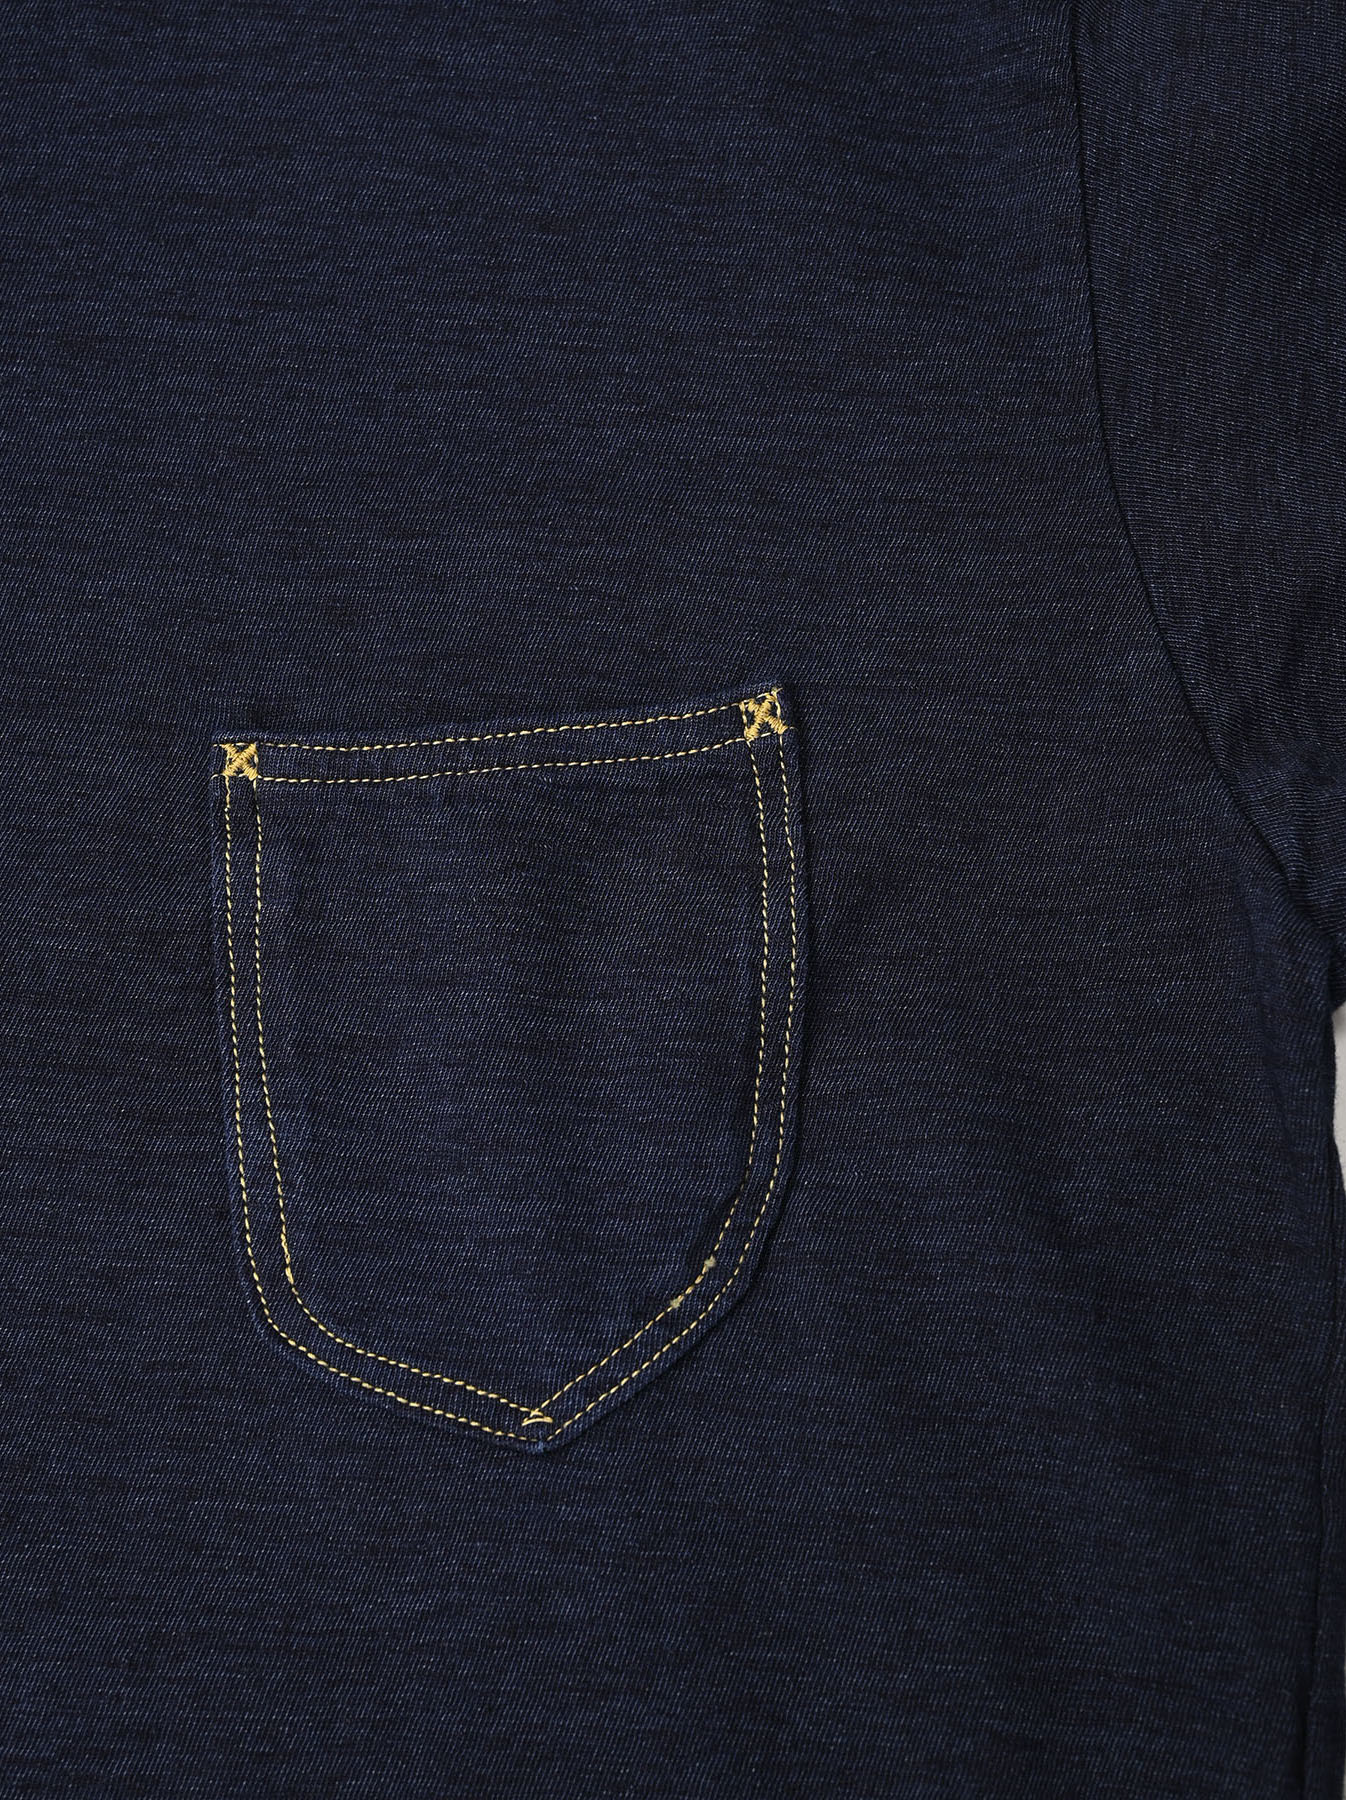 Indigo Zimbabwe 908 Ocean T-shirt-9